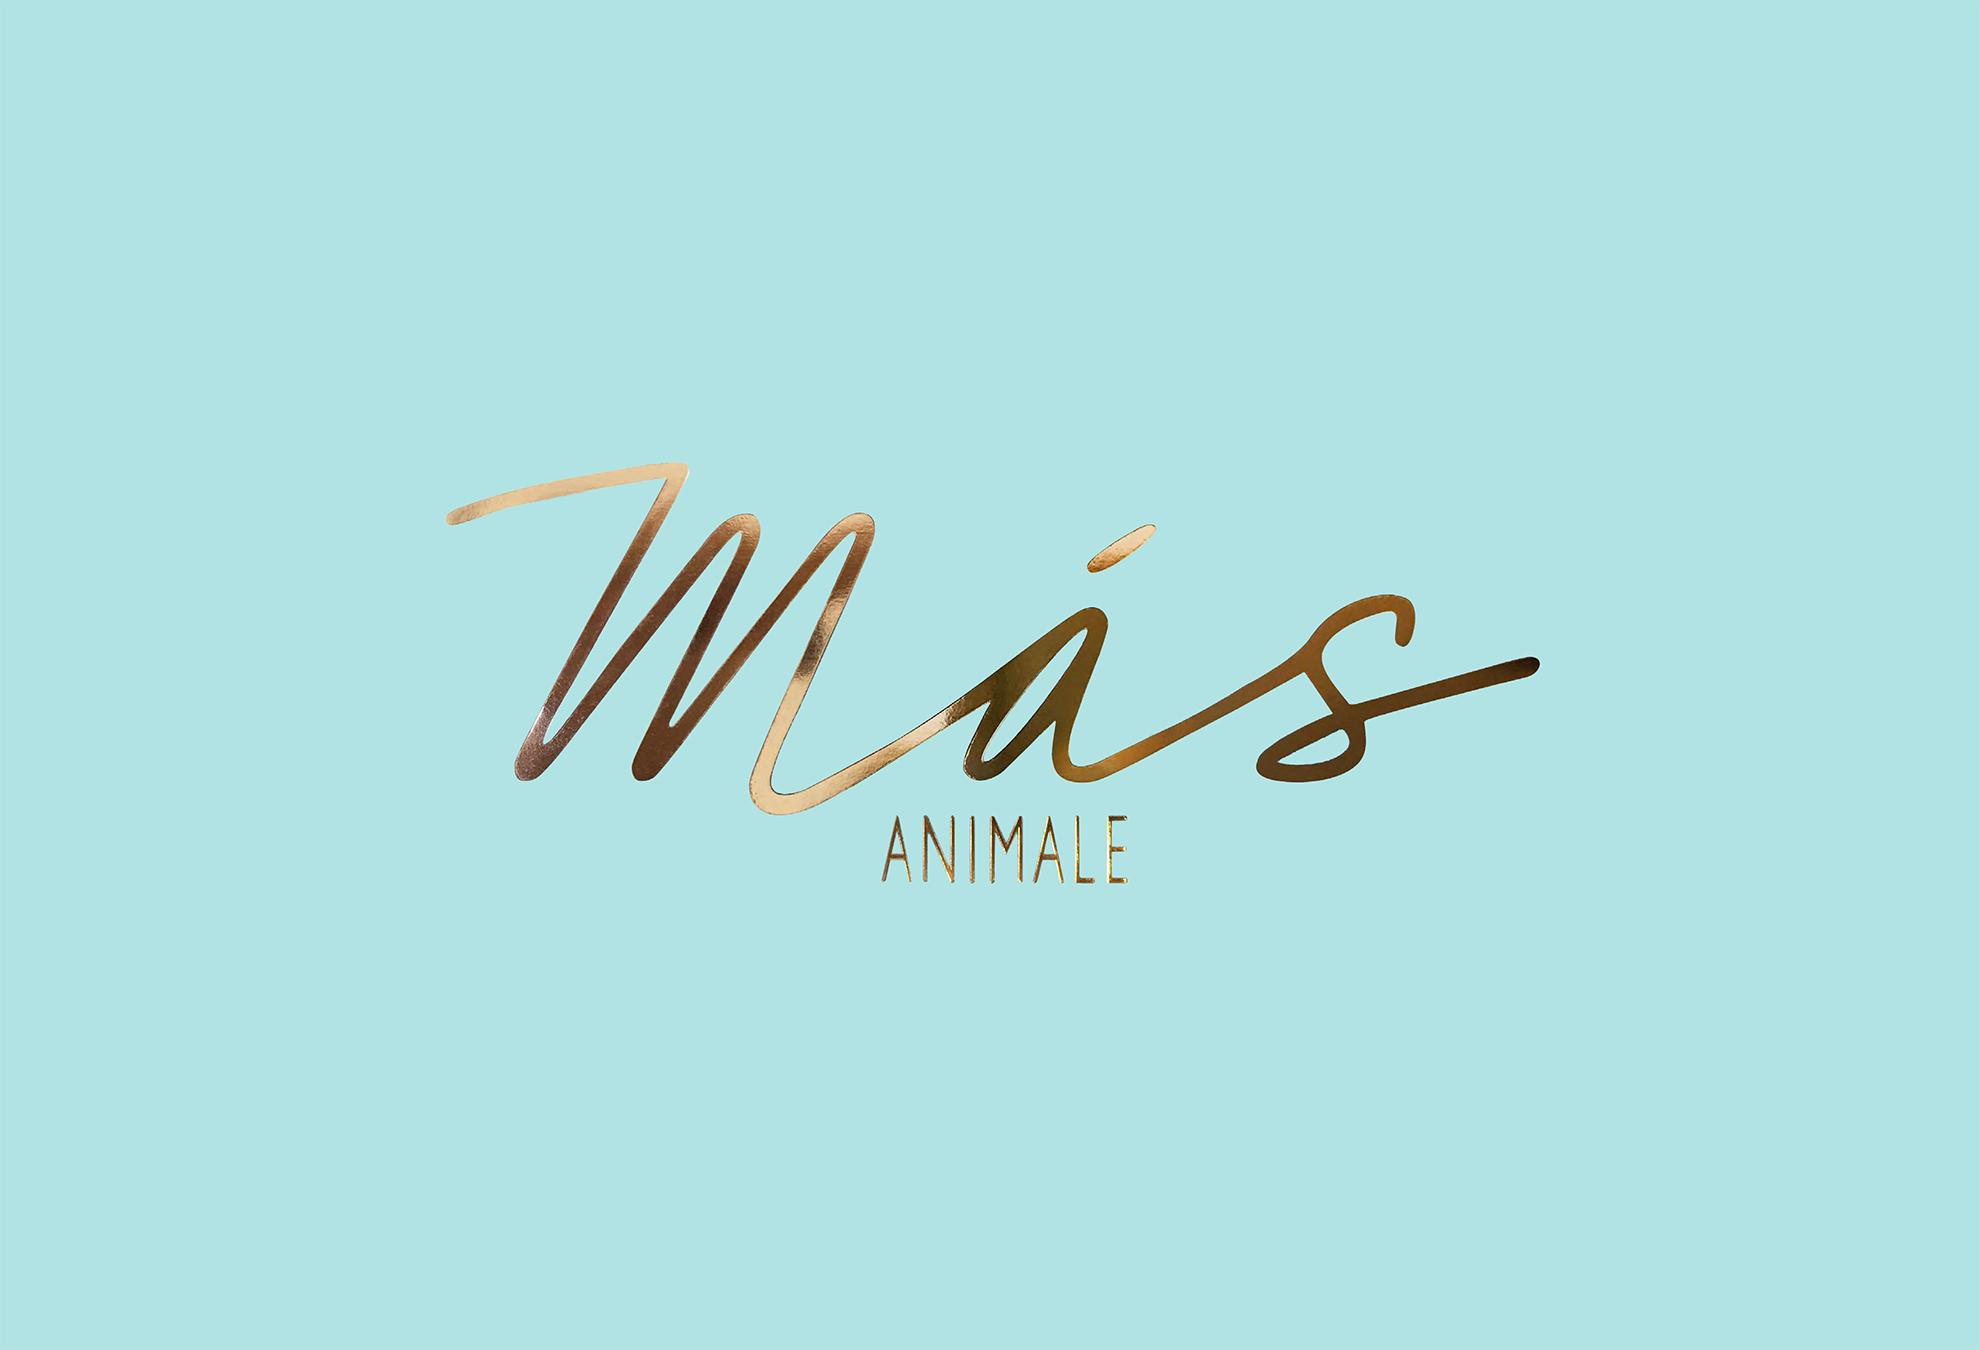 Prospect_Mas-Animale_VIRTUAL-1